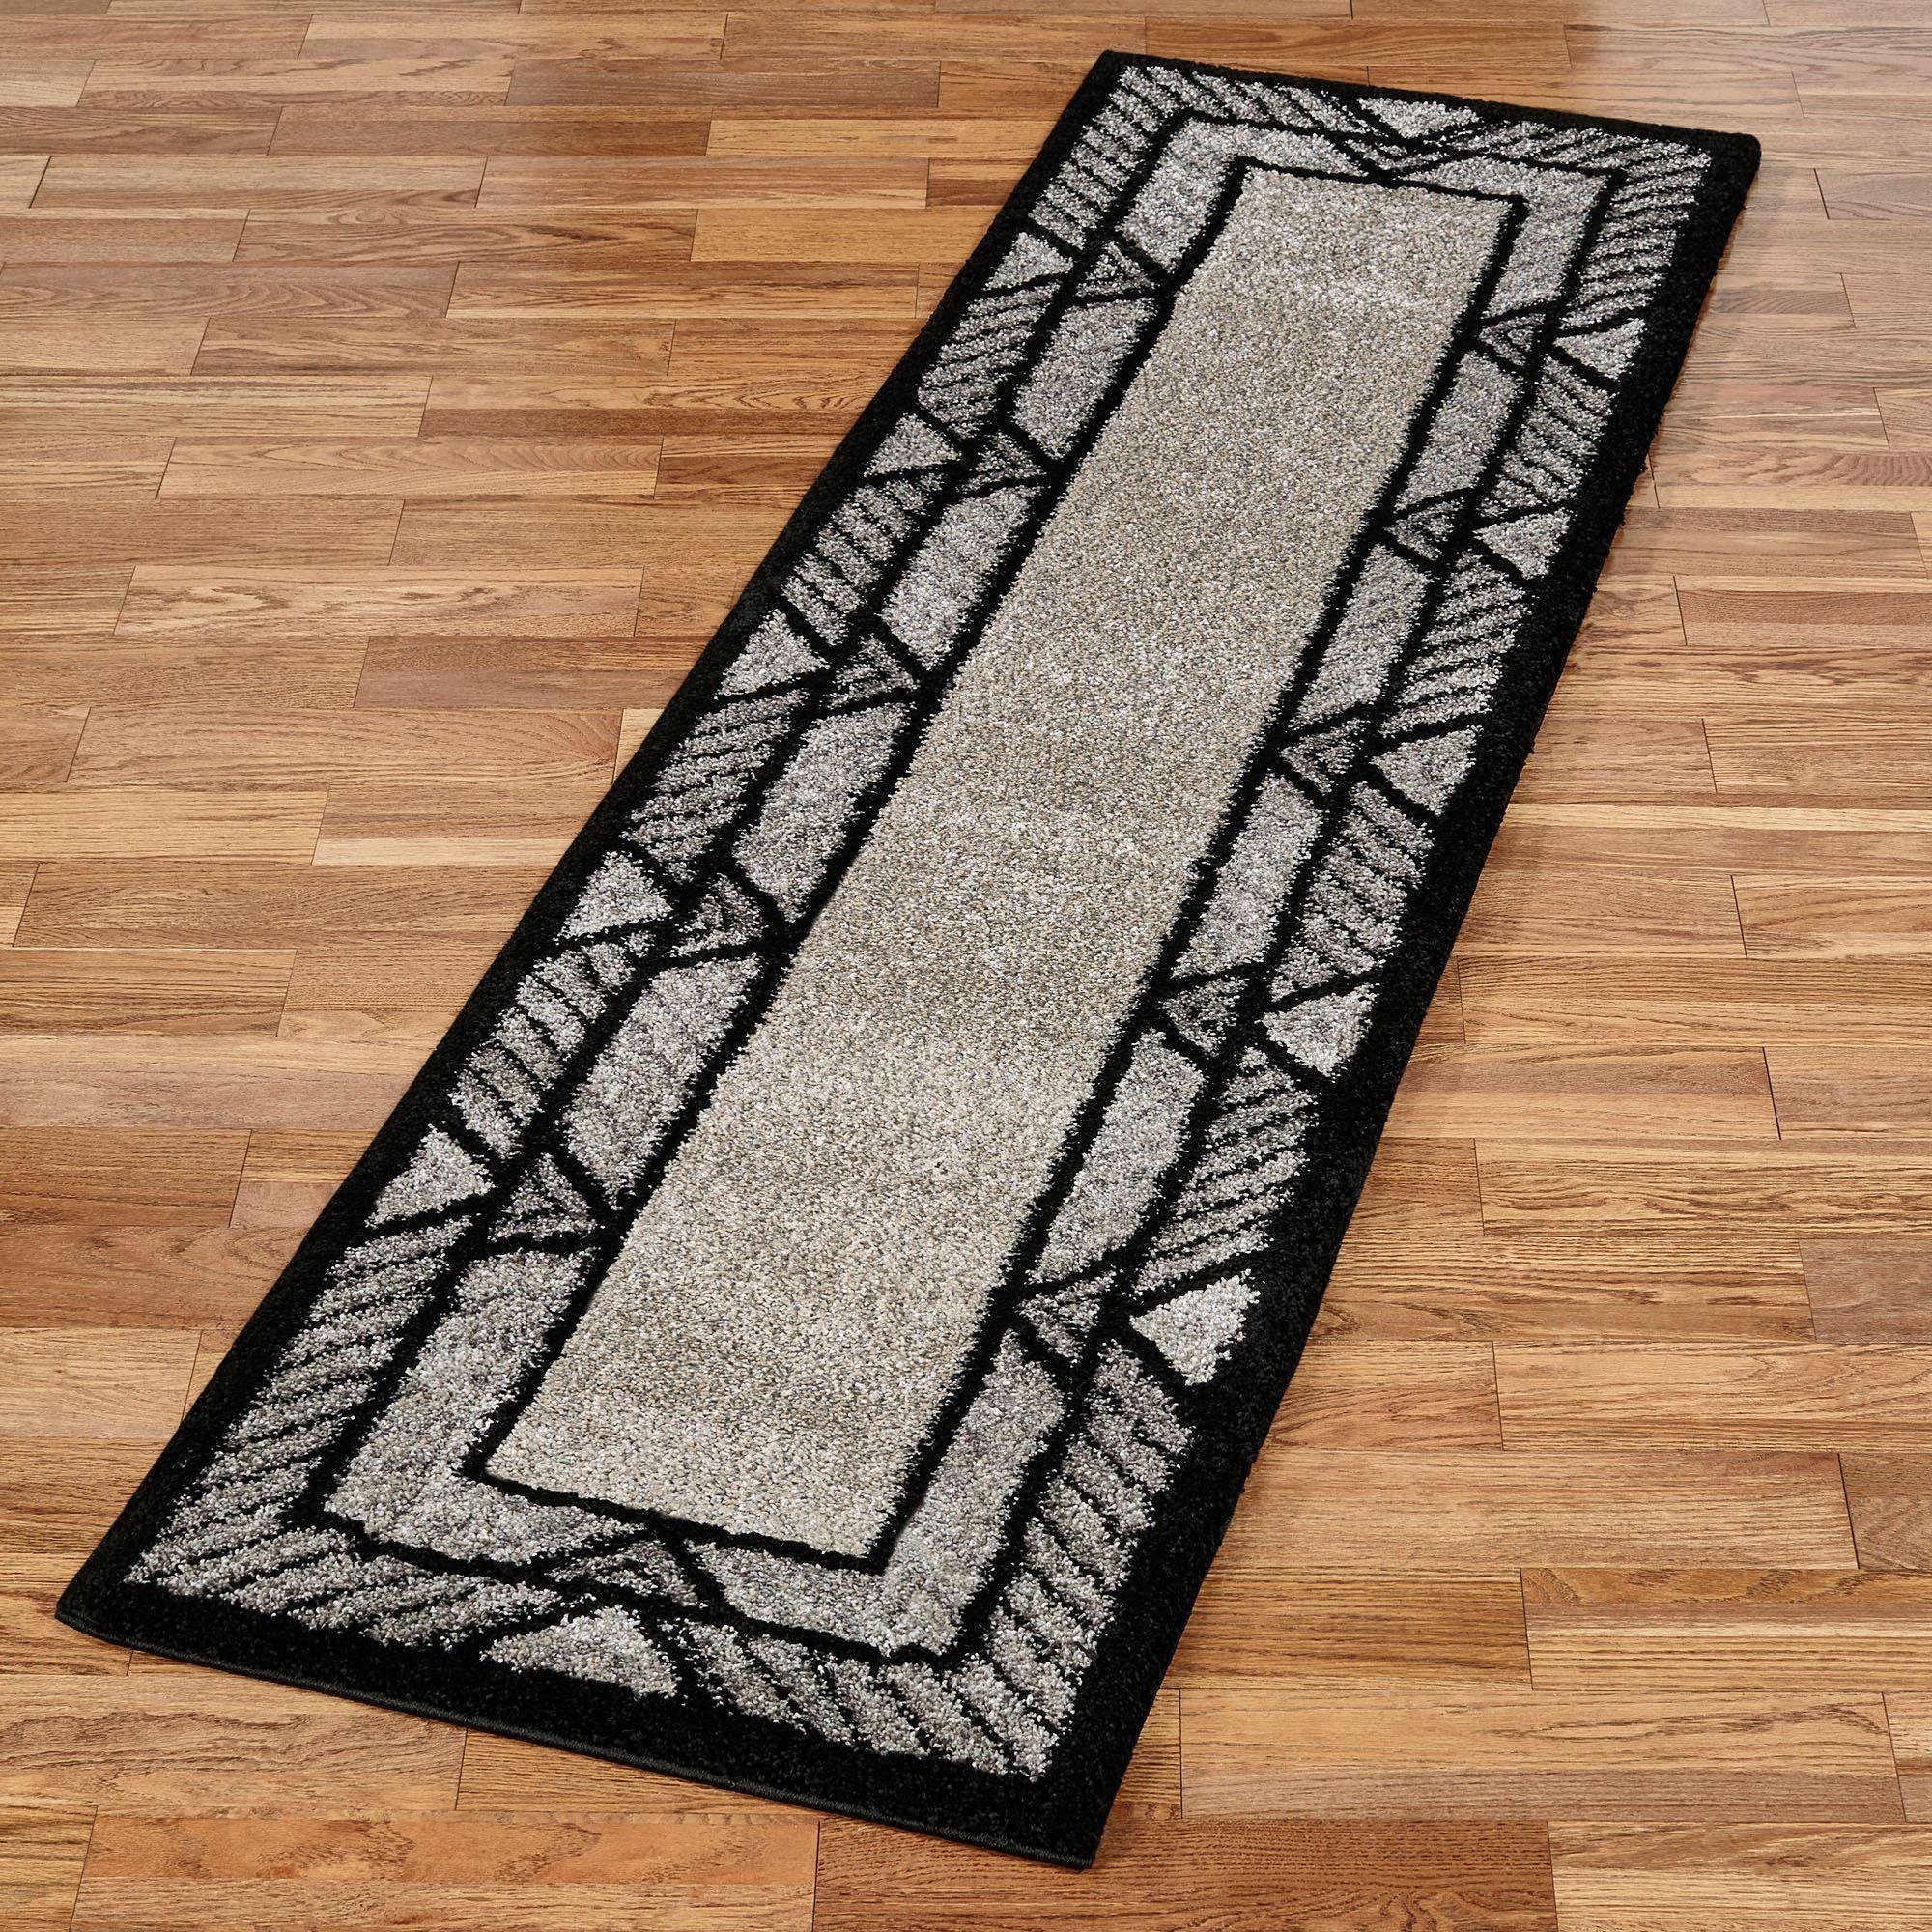 Door Area Rugs : Door plates carpets geometric arts pattern area rugs